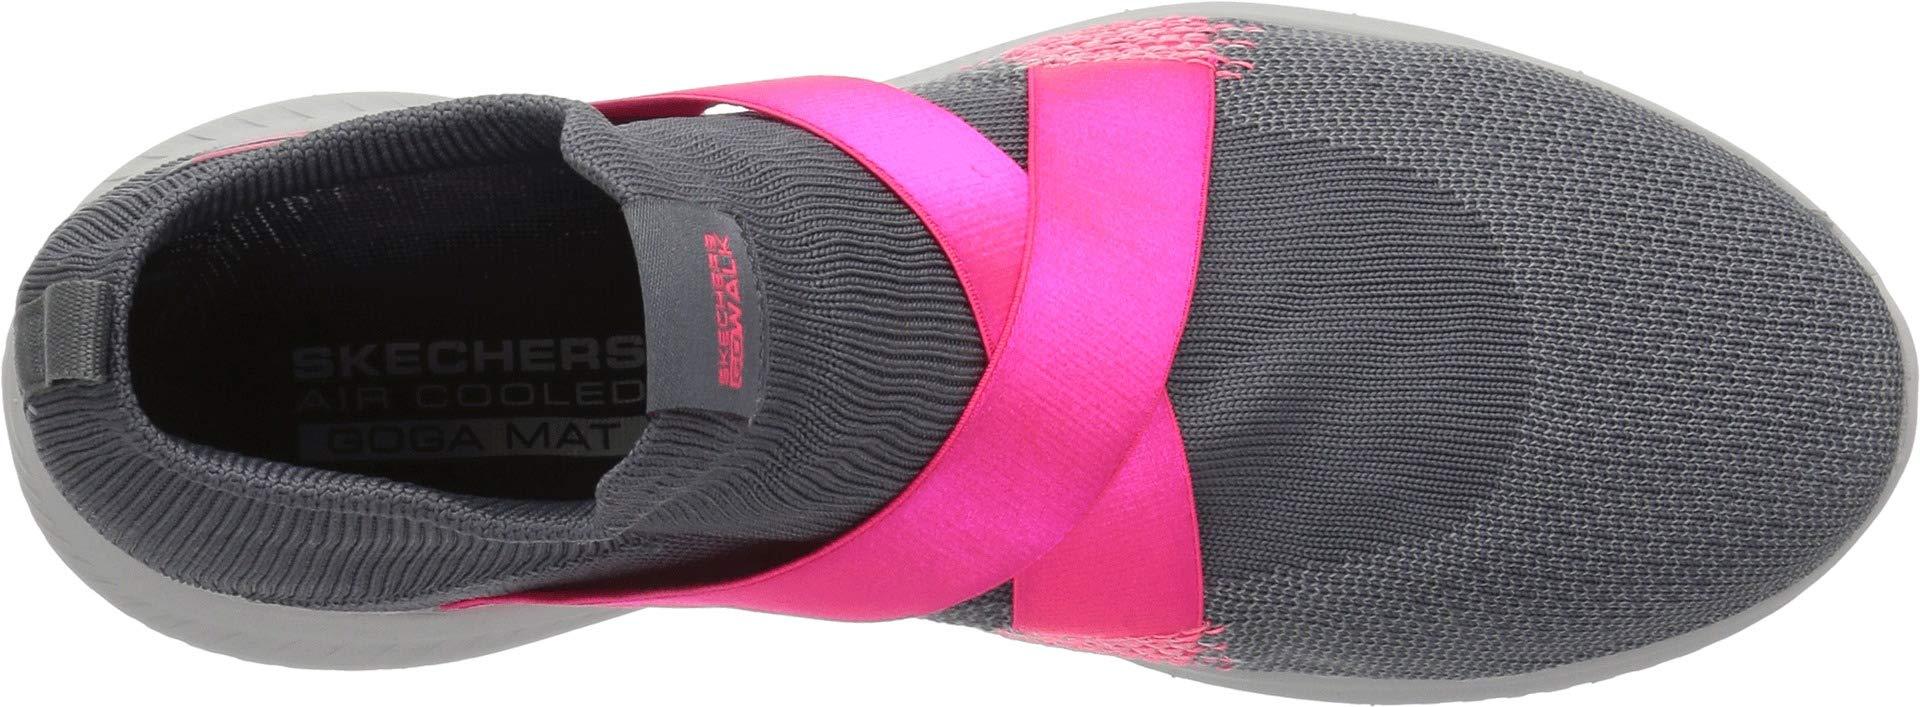 Skechers Performance Women's GO Walk Revolution Ultra-15669 Sneaker,Charcoal/hot Pink,8 M US by Skechers (Image #2)